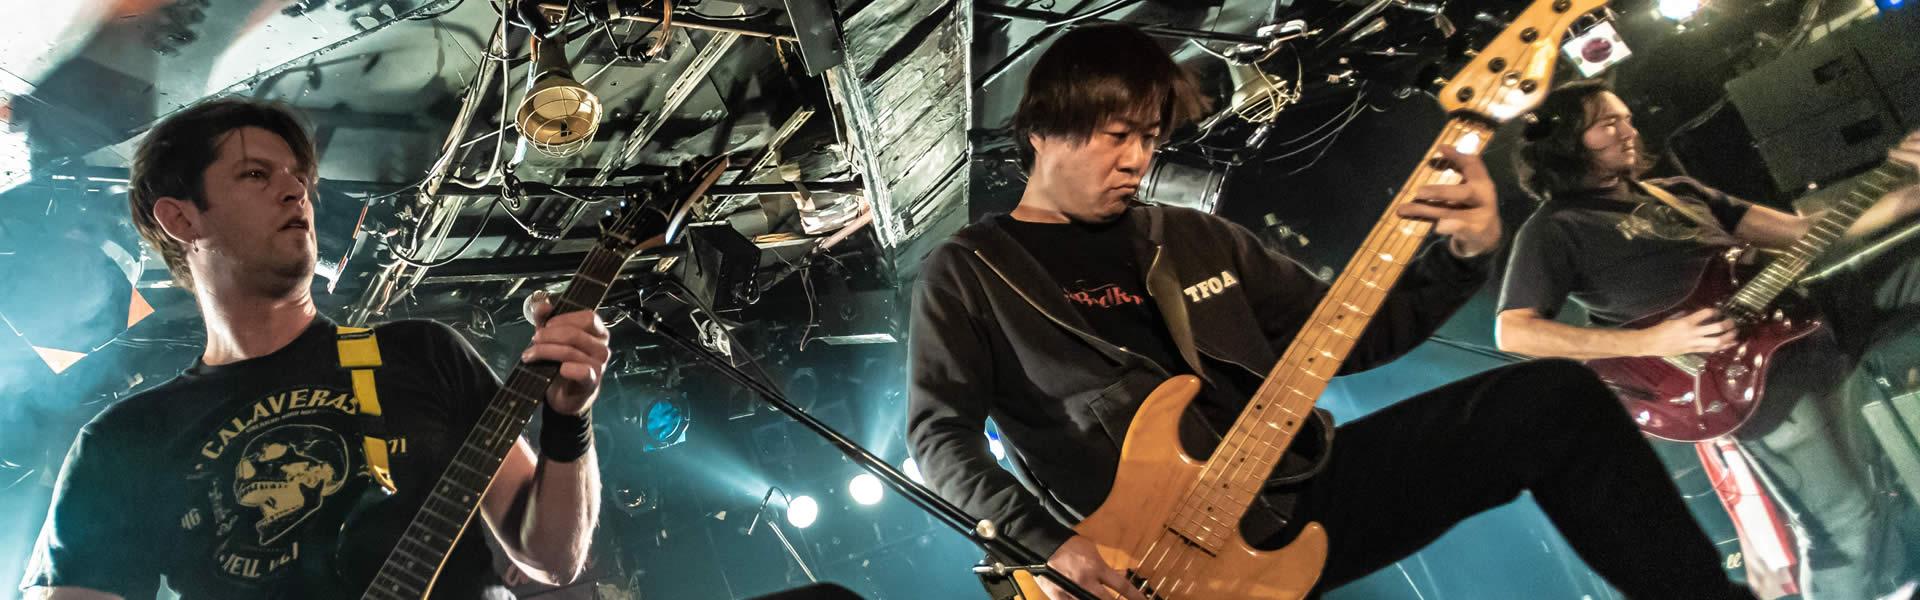 RedBedRock - Multicultural world hard rock latin band in Japan.